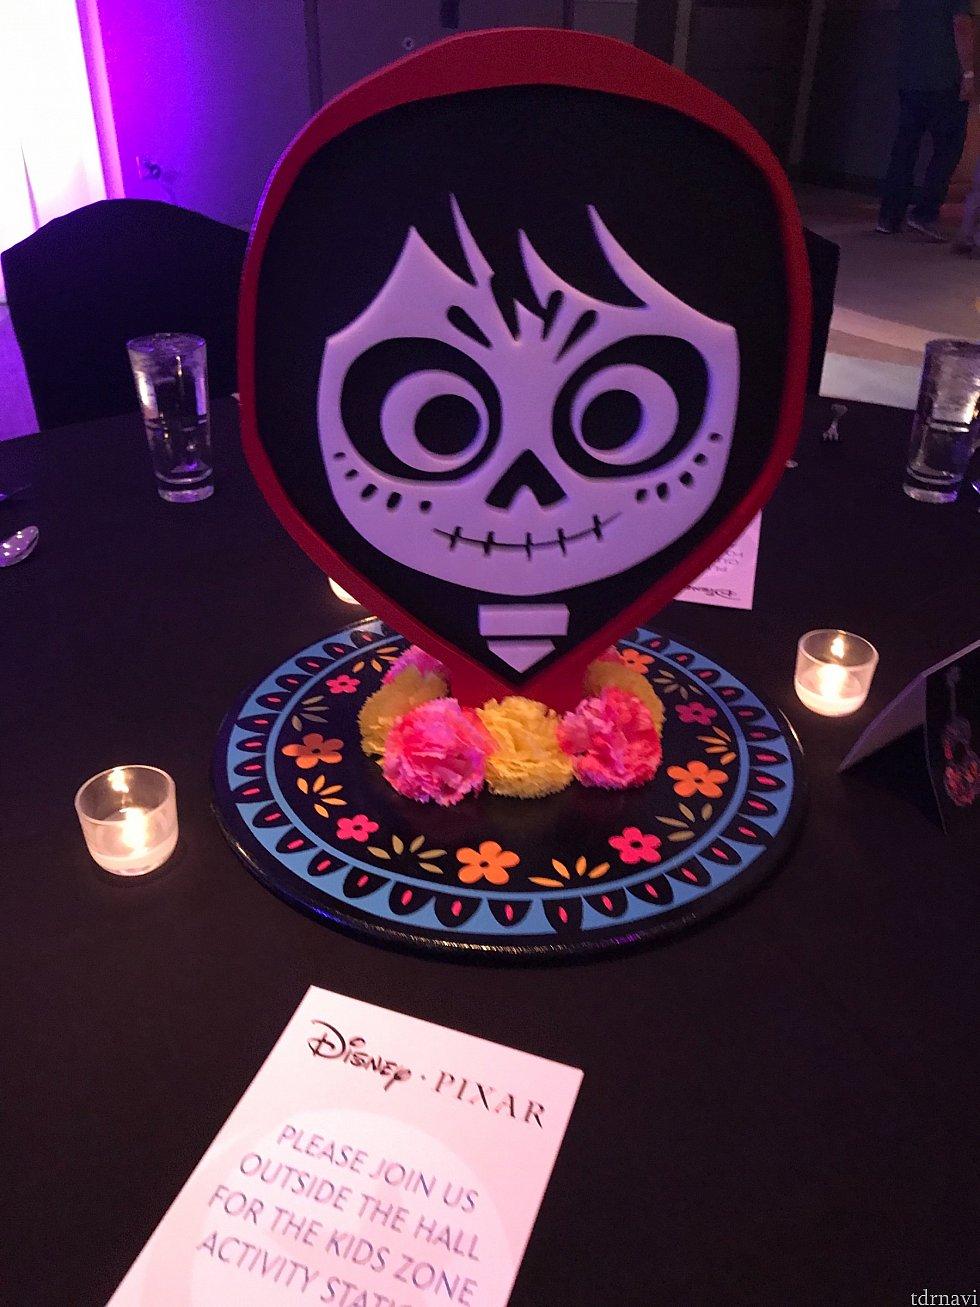 Miguelのテーブル可愛い😍